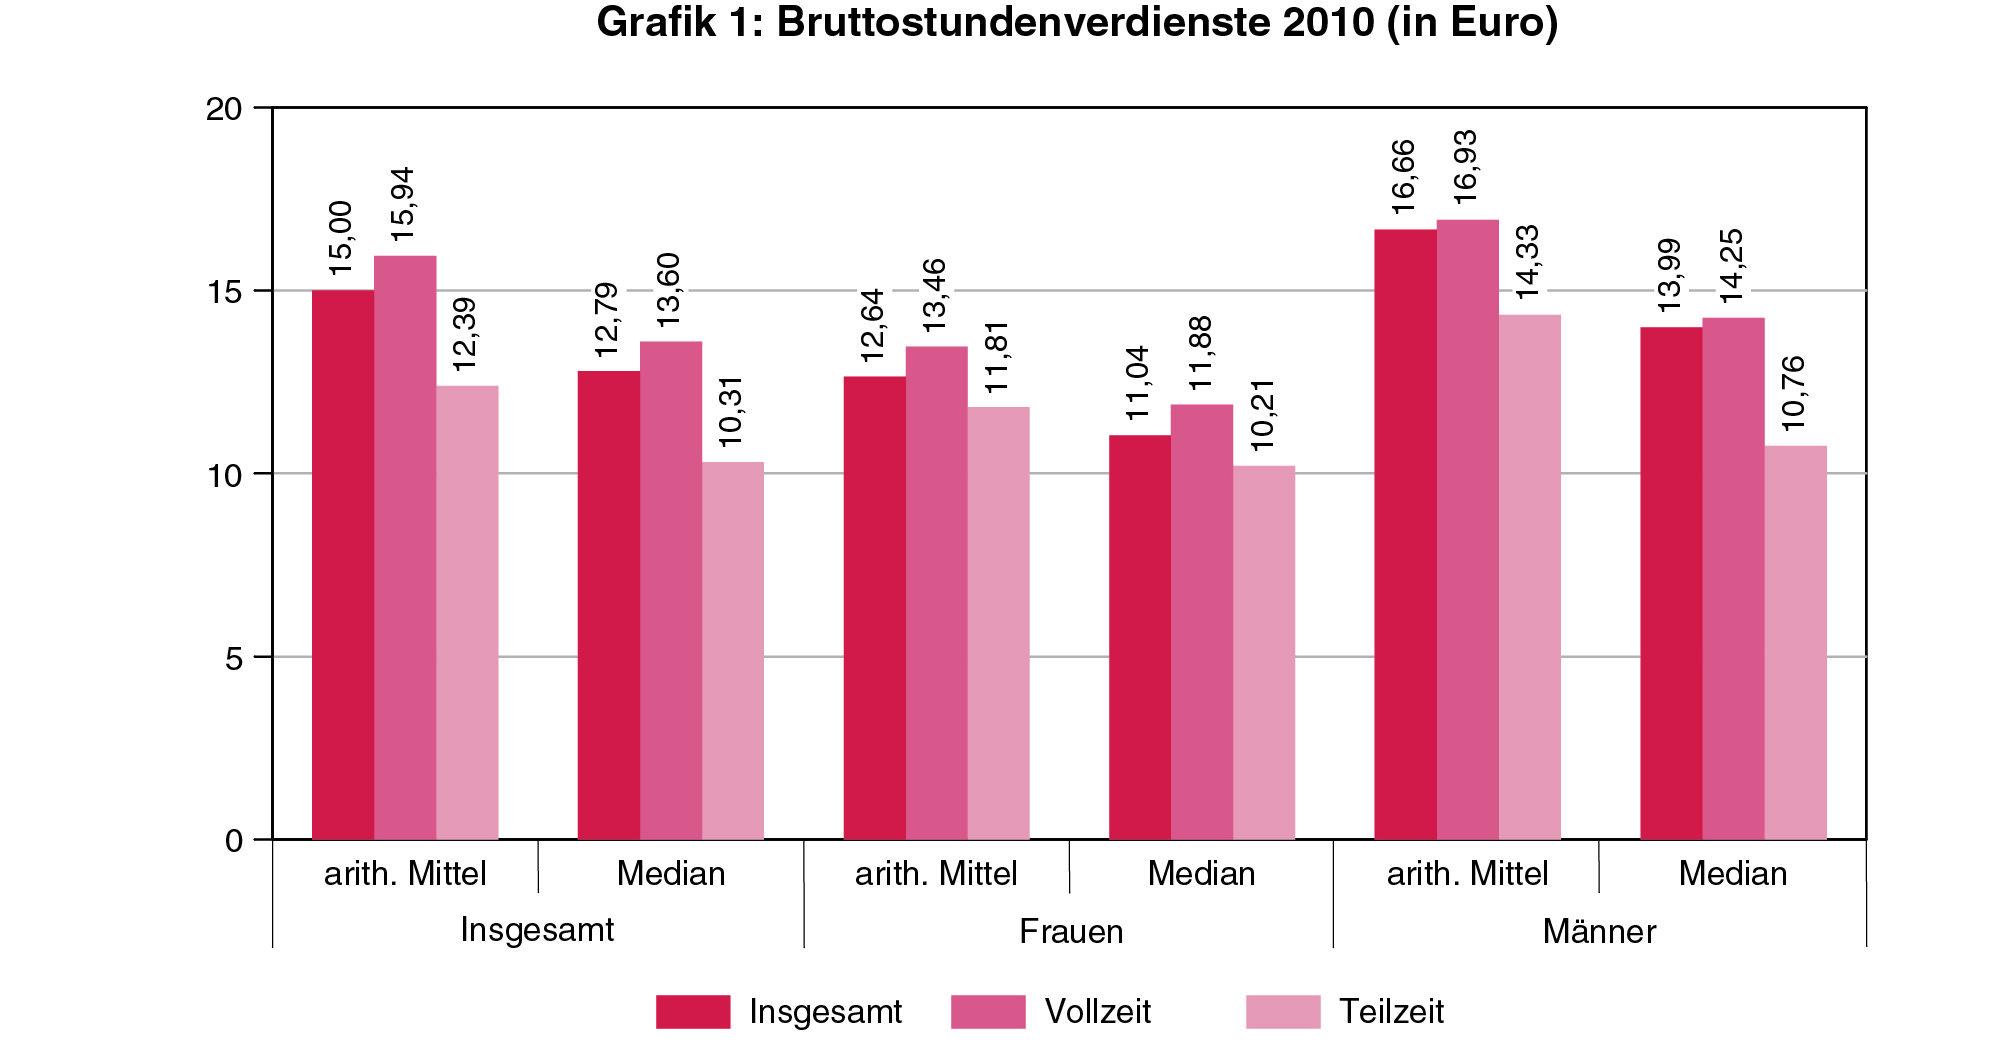 Q:Grafikenmarthae_mailAK_grafik_1.EPS